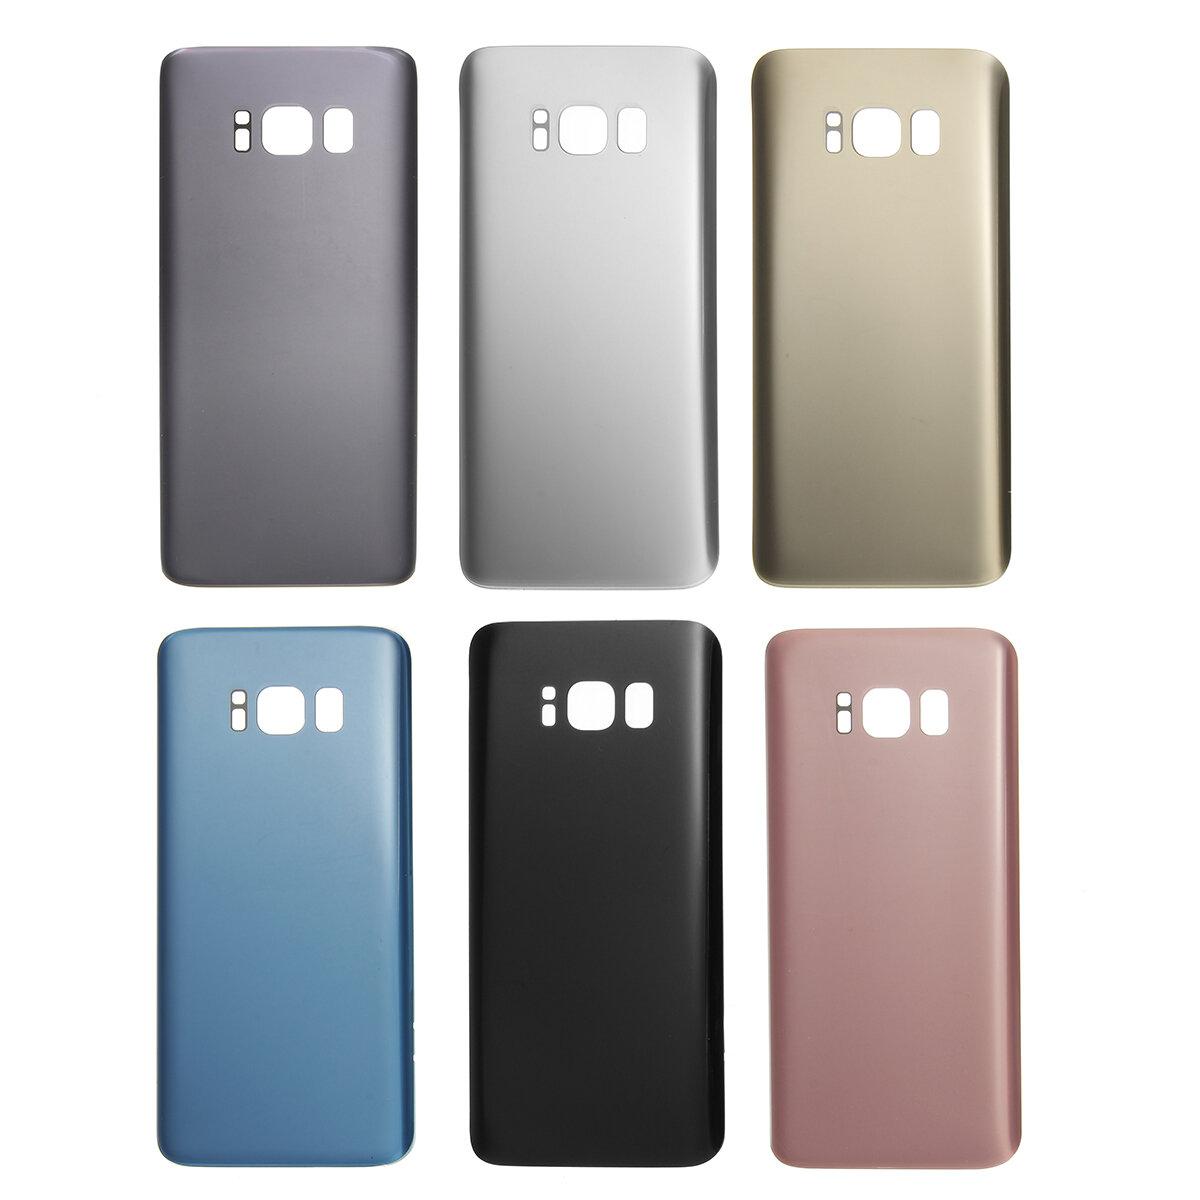 Arka Arka Cam Batarya Kapak Replacement for Samsung Galaxy S8